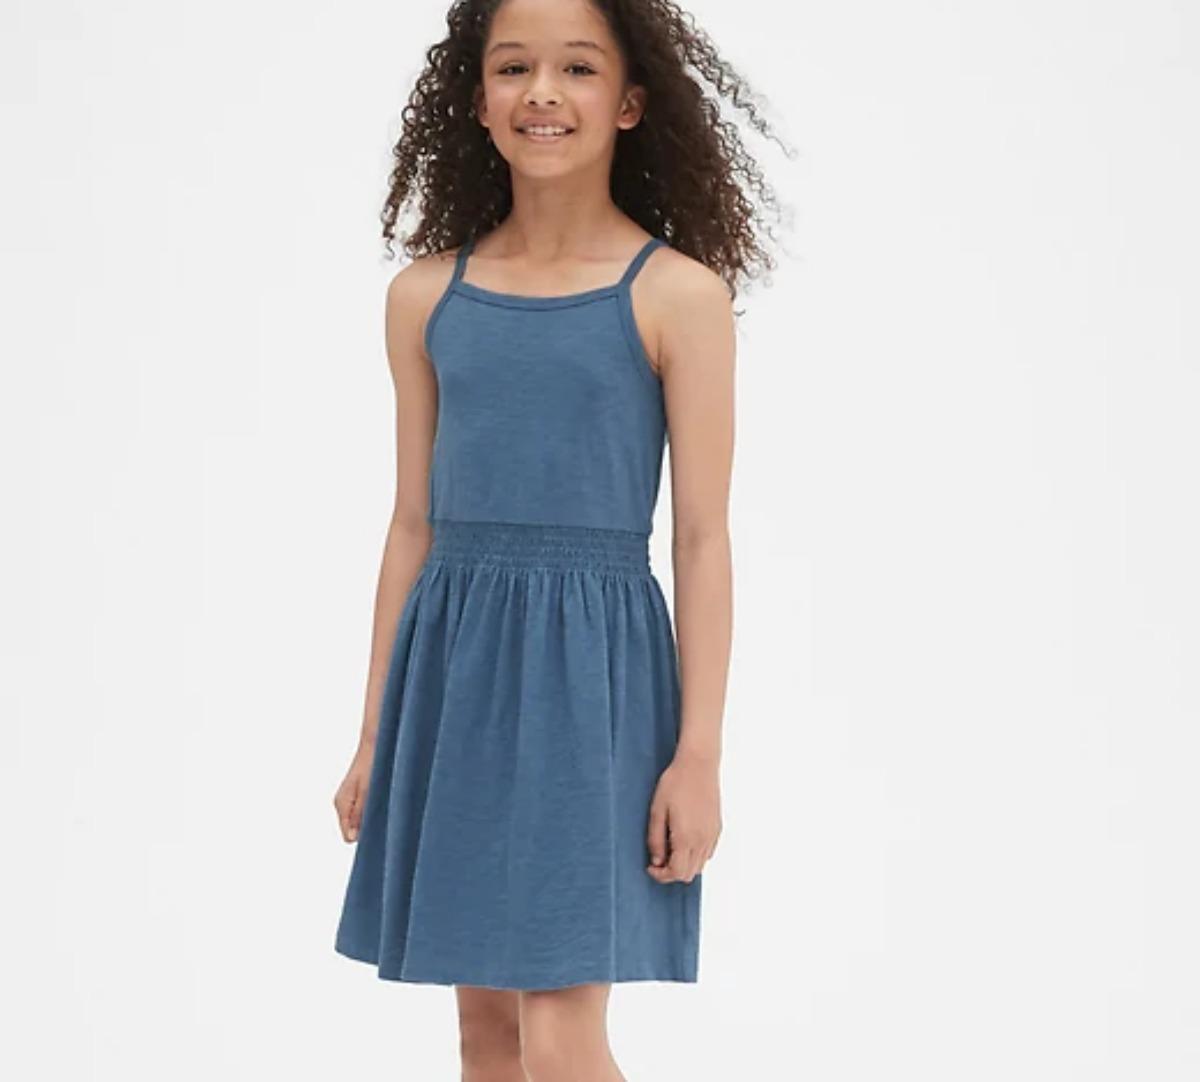 Girl wearing denim Gap dress